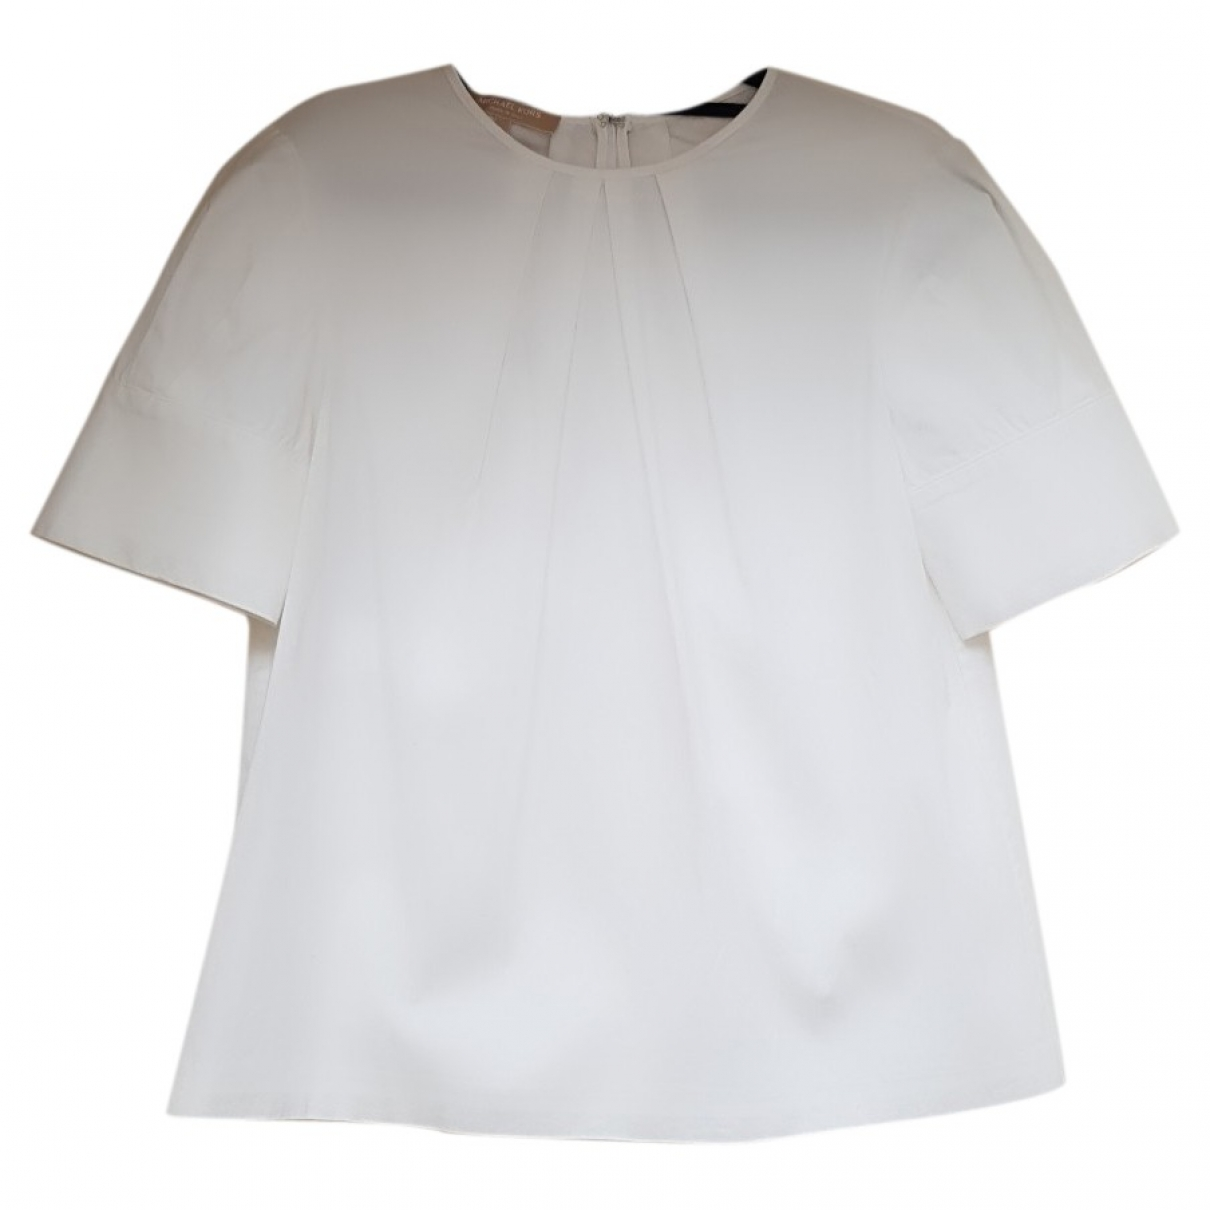 Michael Kors \N Ecru Cotton  top for Women 2 US